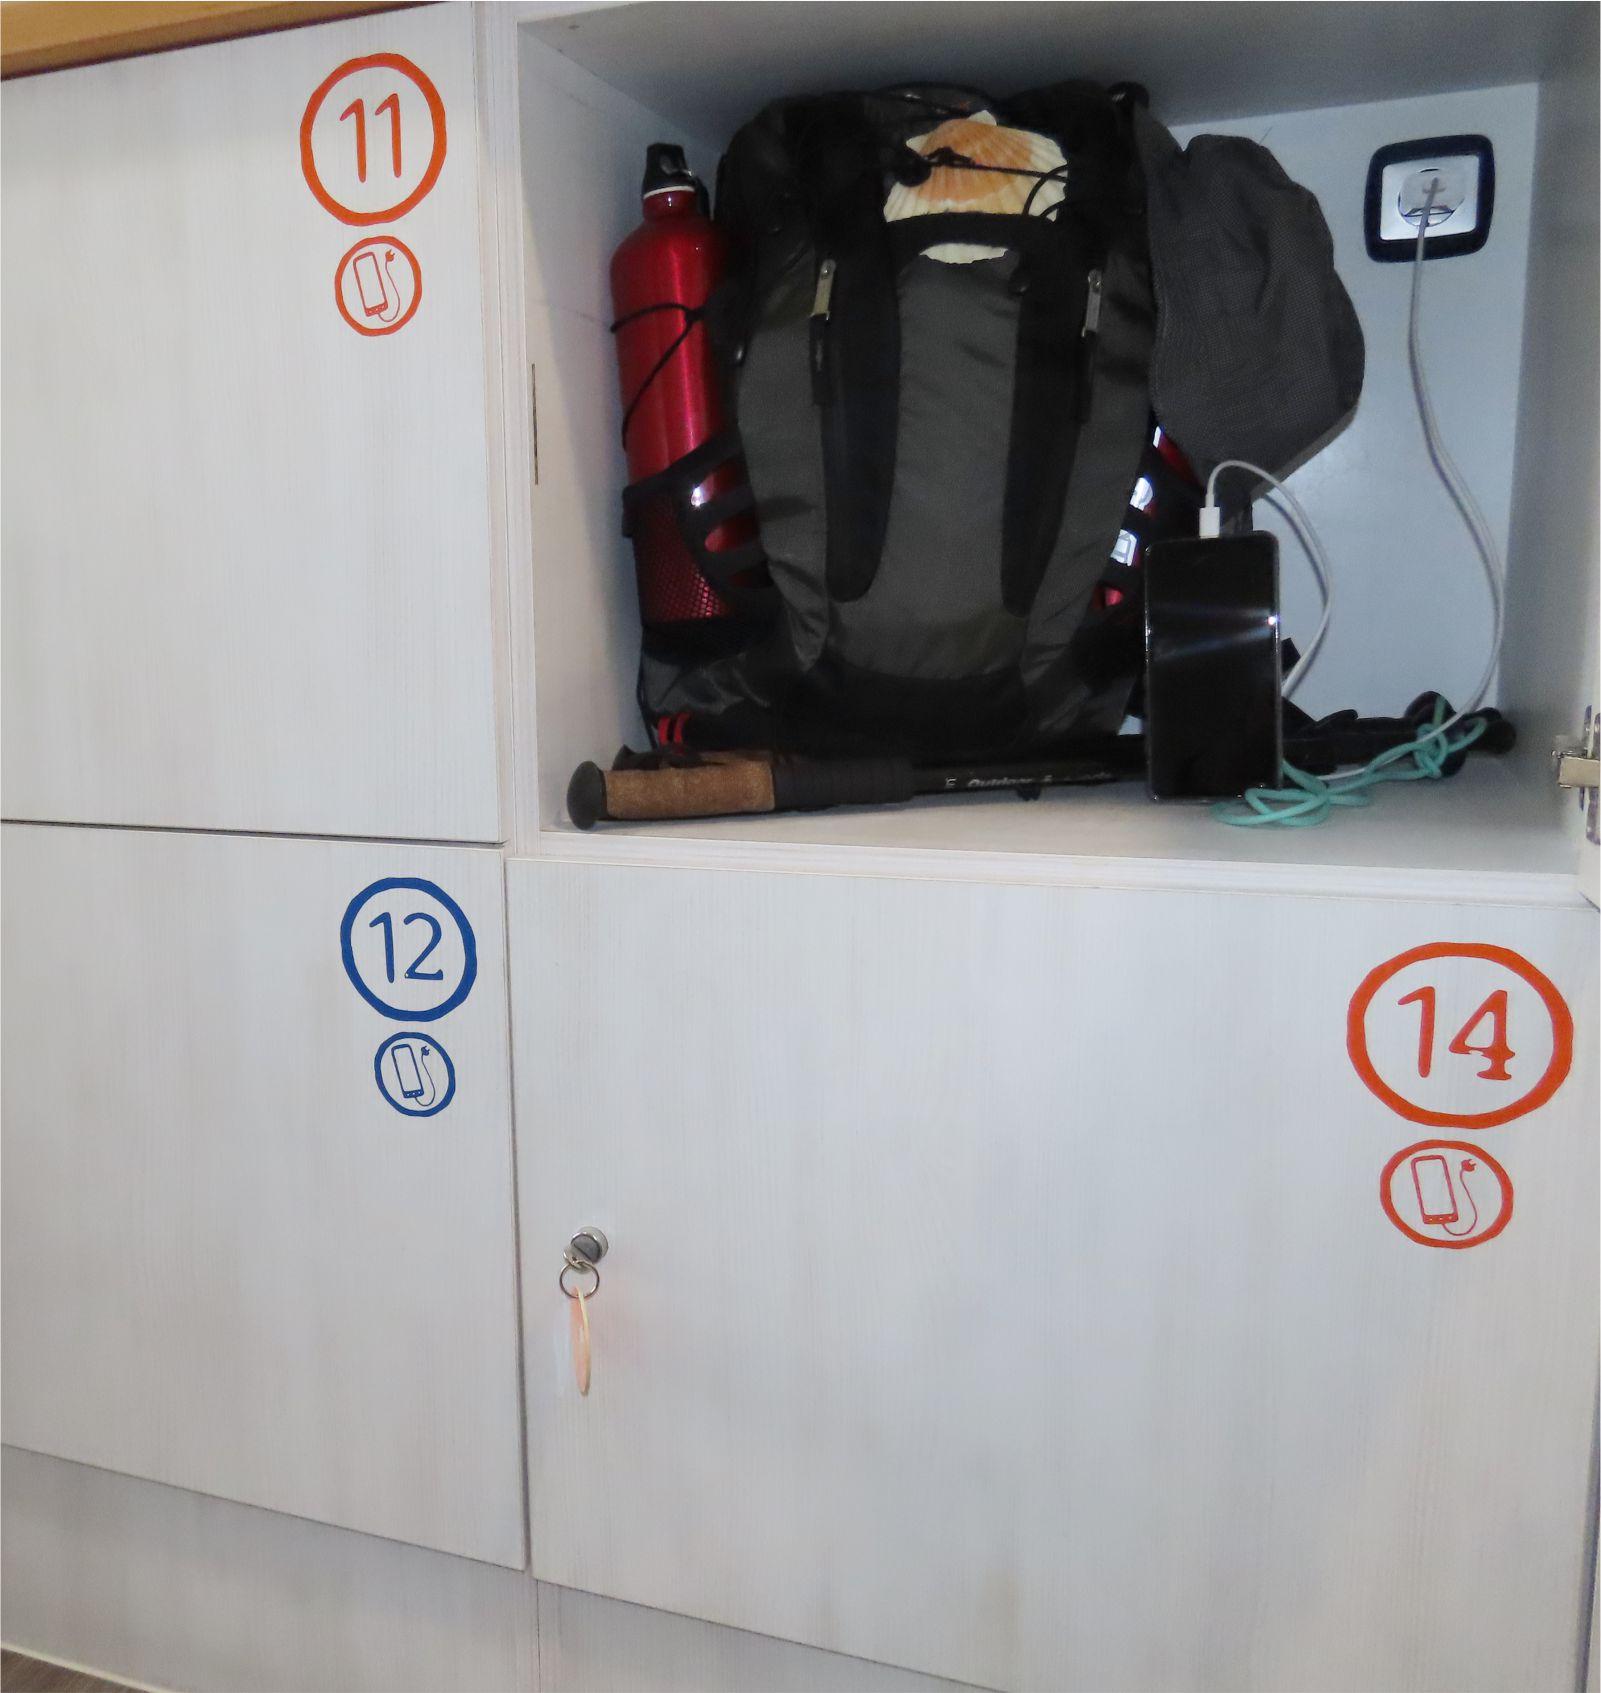 Taquillas con enchufe y llave - Lockers with plug and key